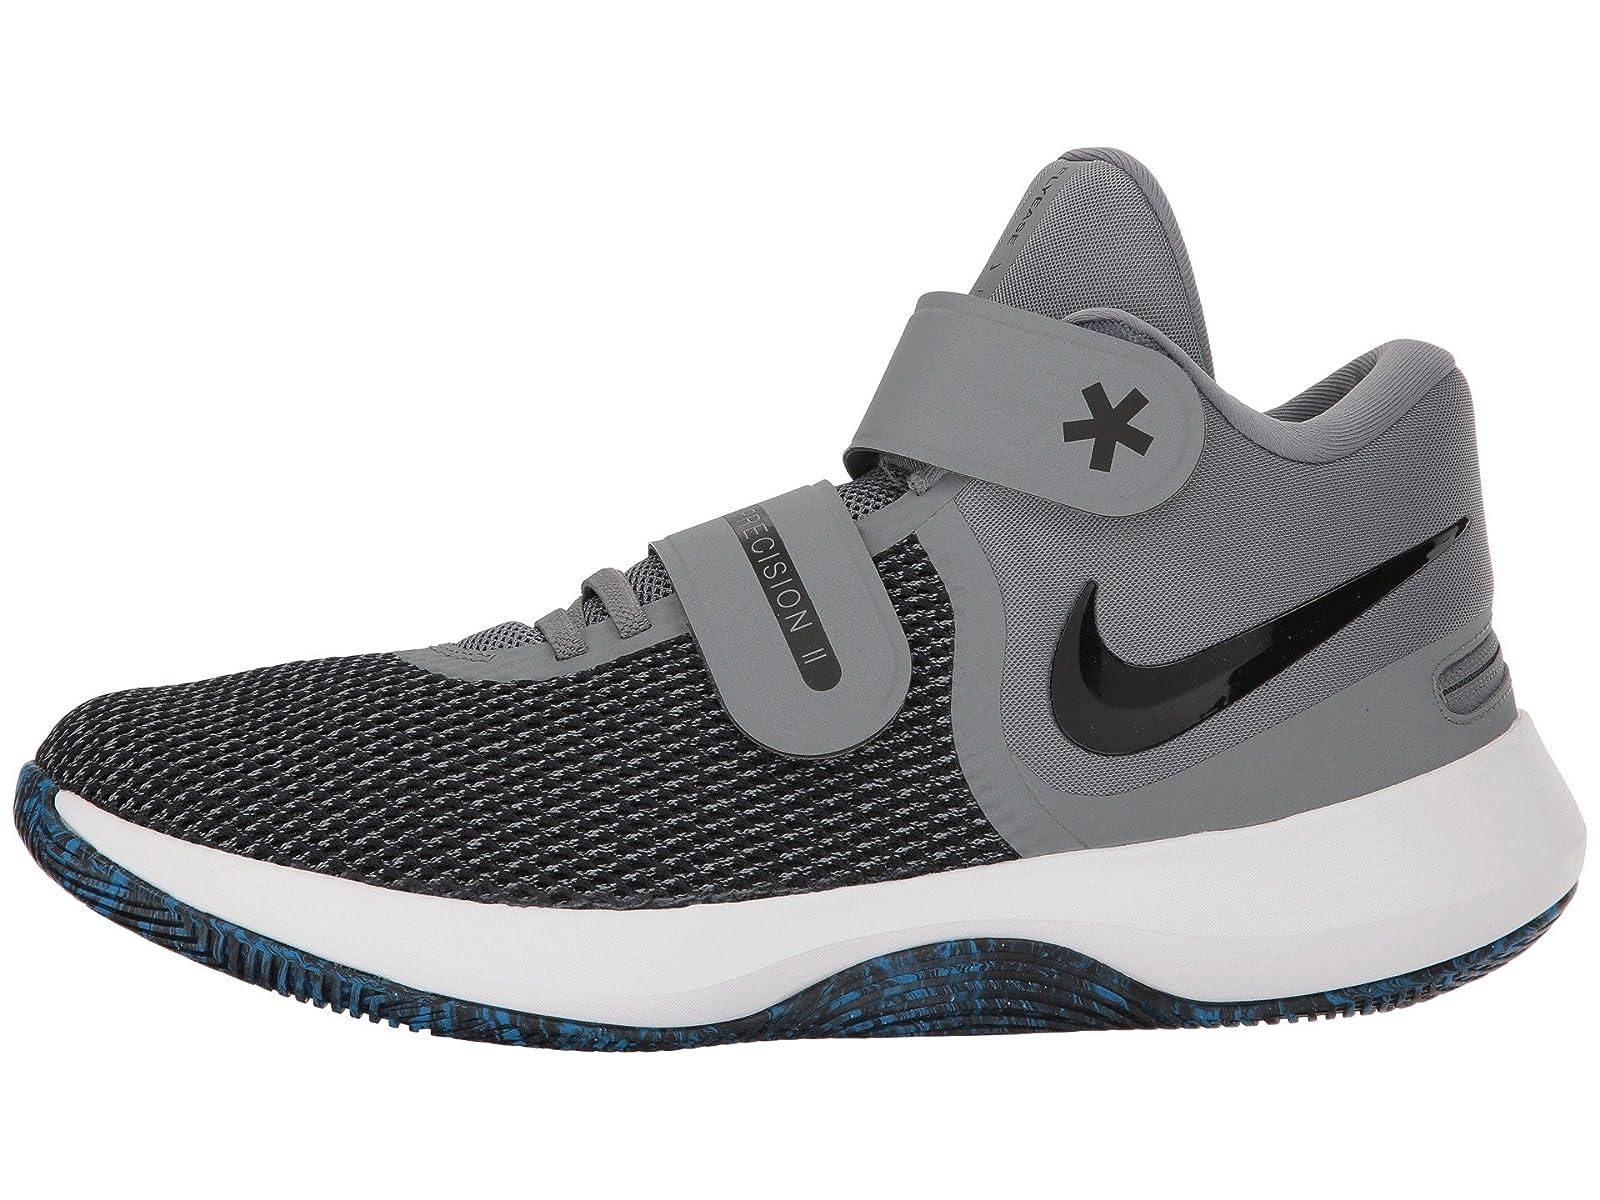 sports shoes c0d65 34845 Mr Ms - Nike Air - Precision II FlyEase - Air High Quality ...